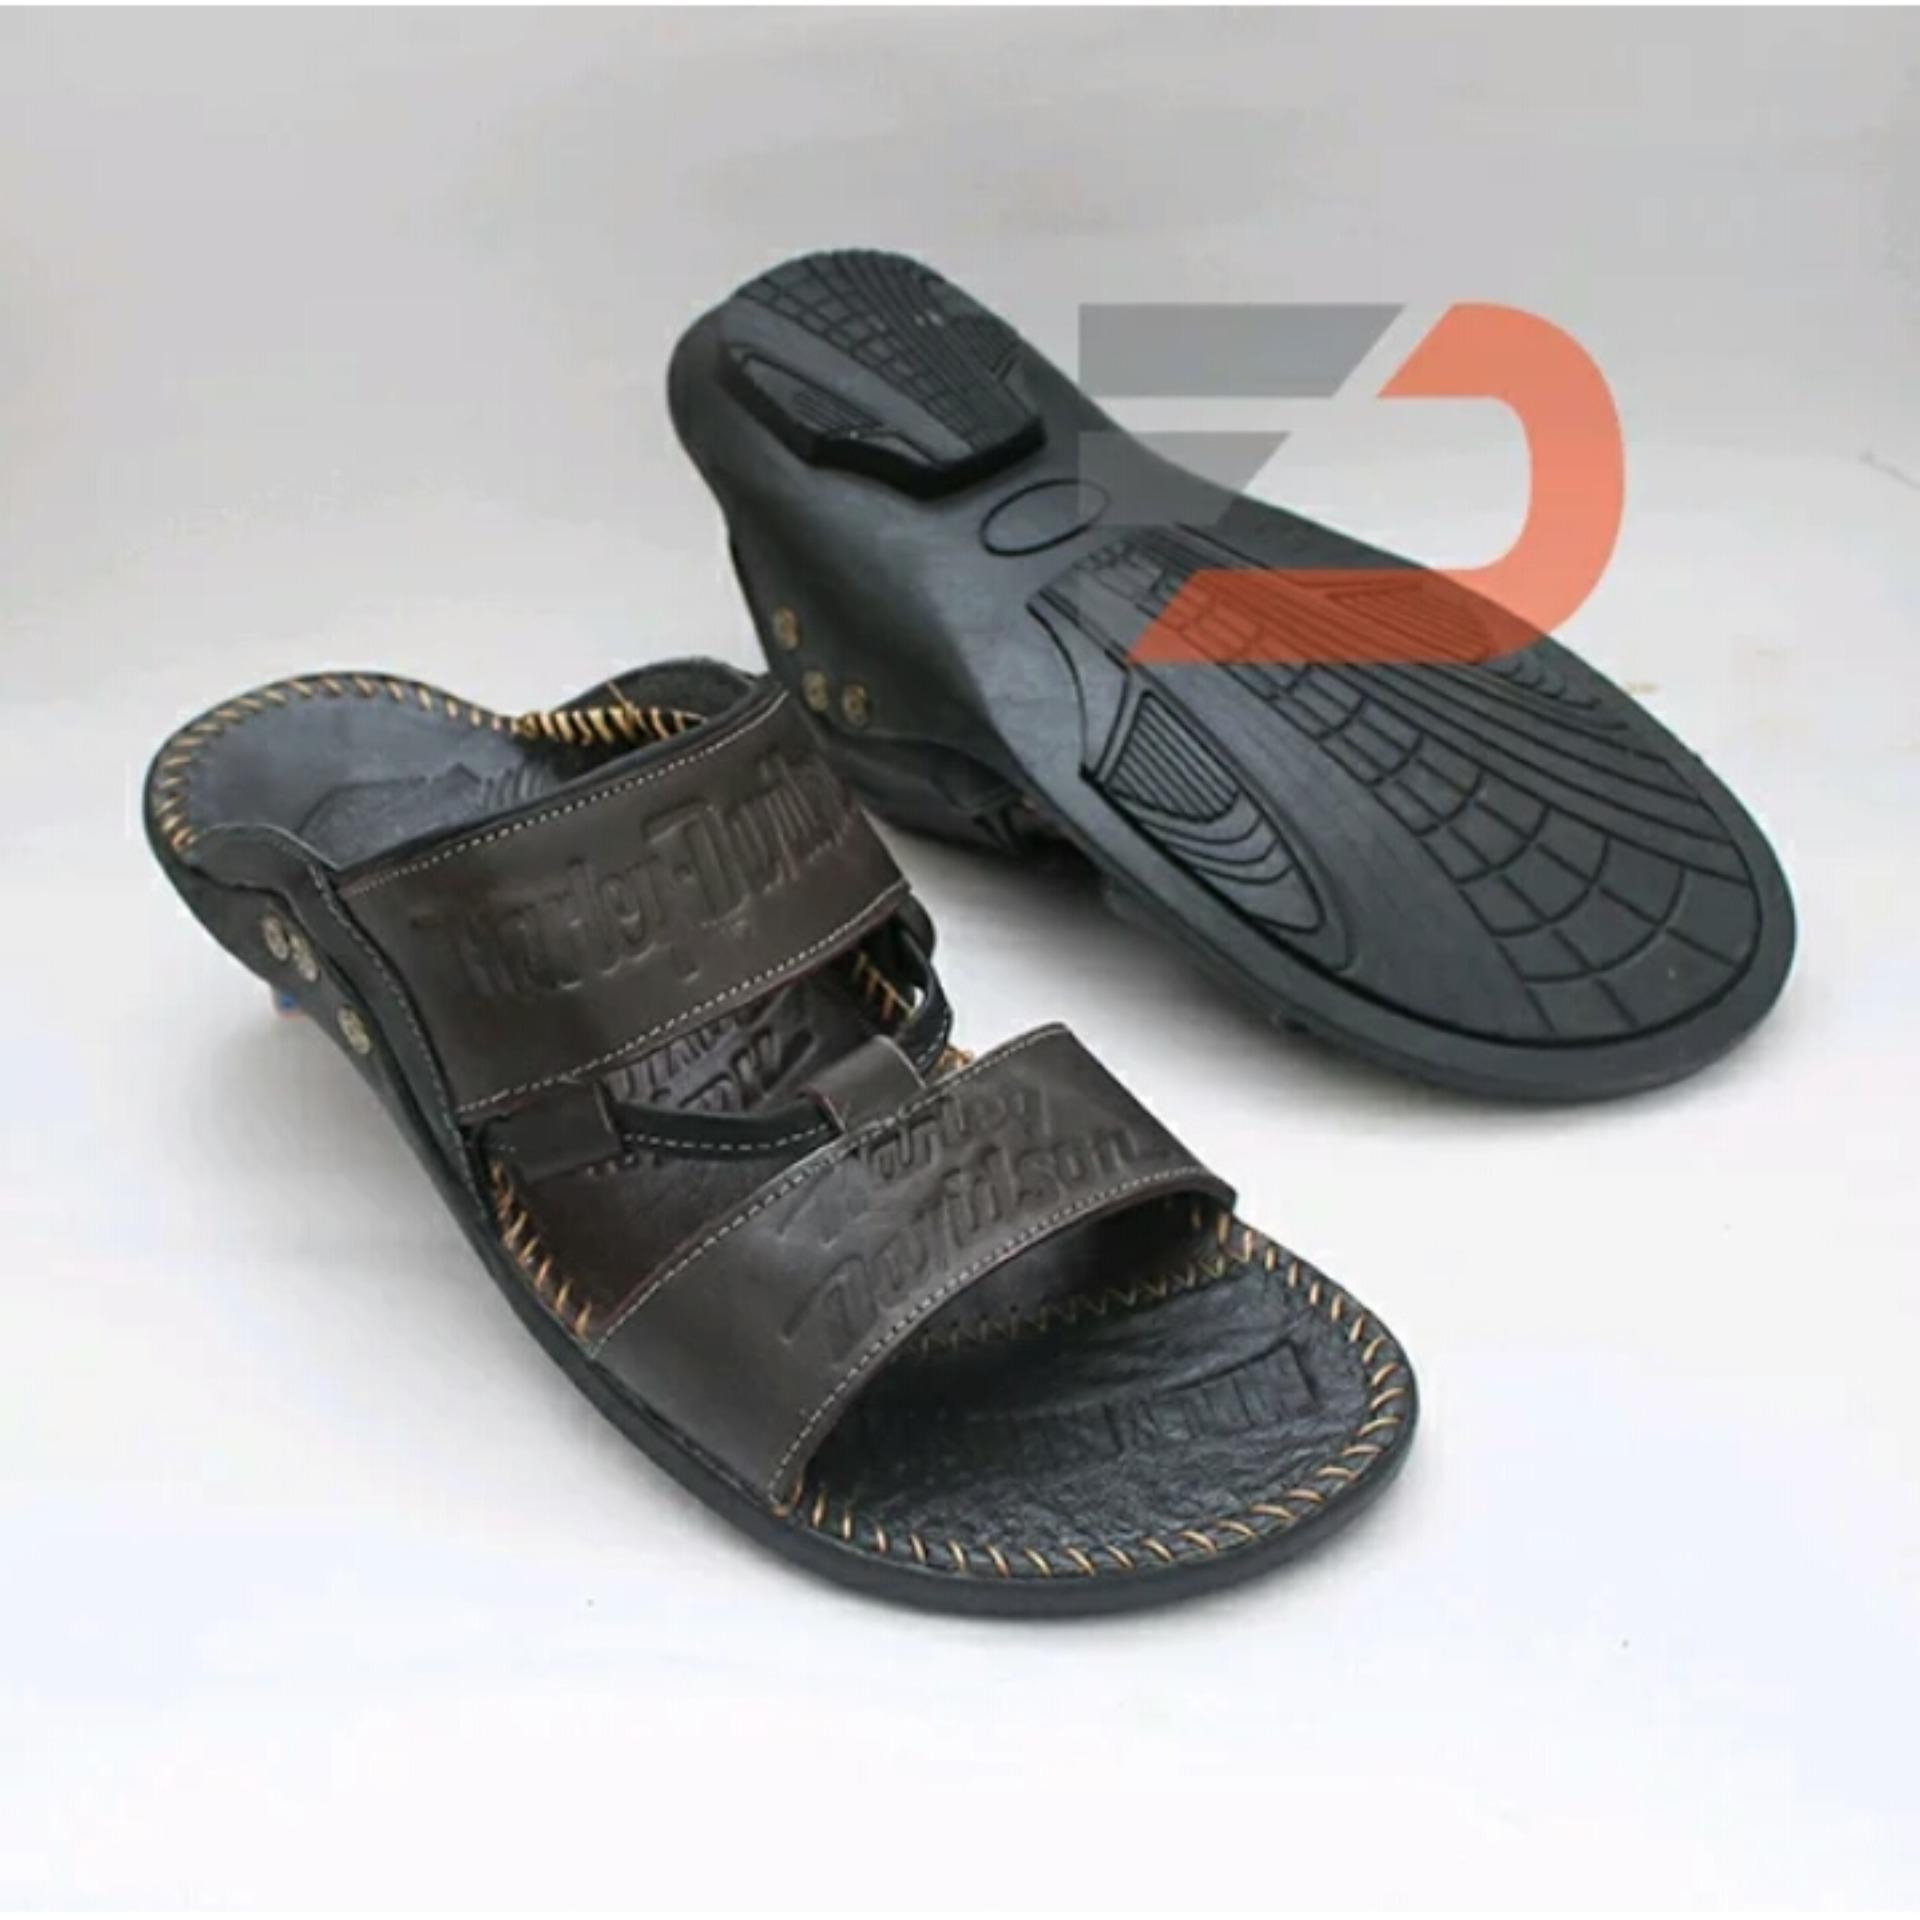 Sandal Santai Japit Pria Bahan Kulit Sapi Asli HR 1